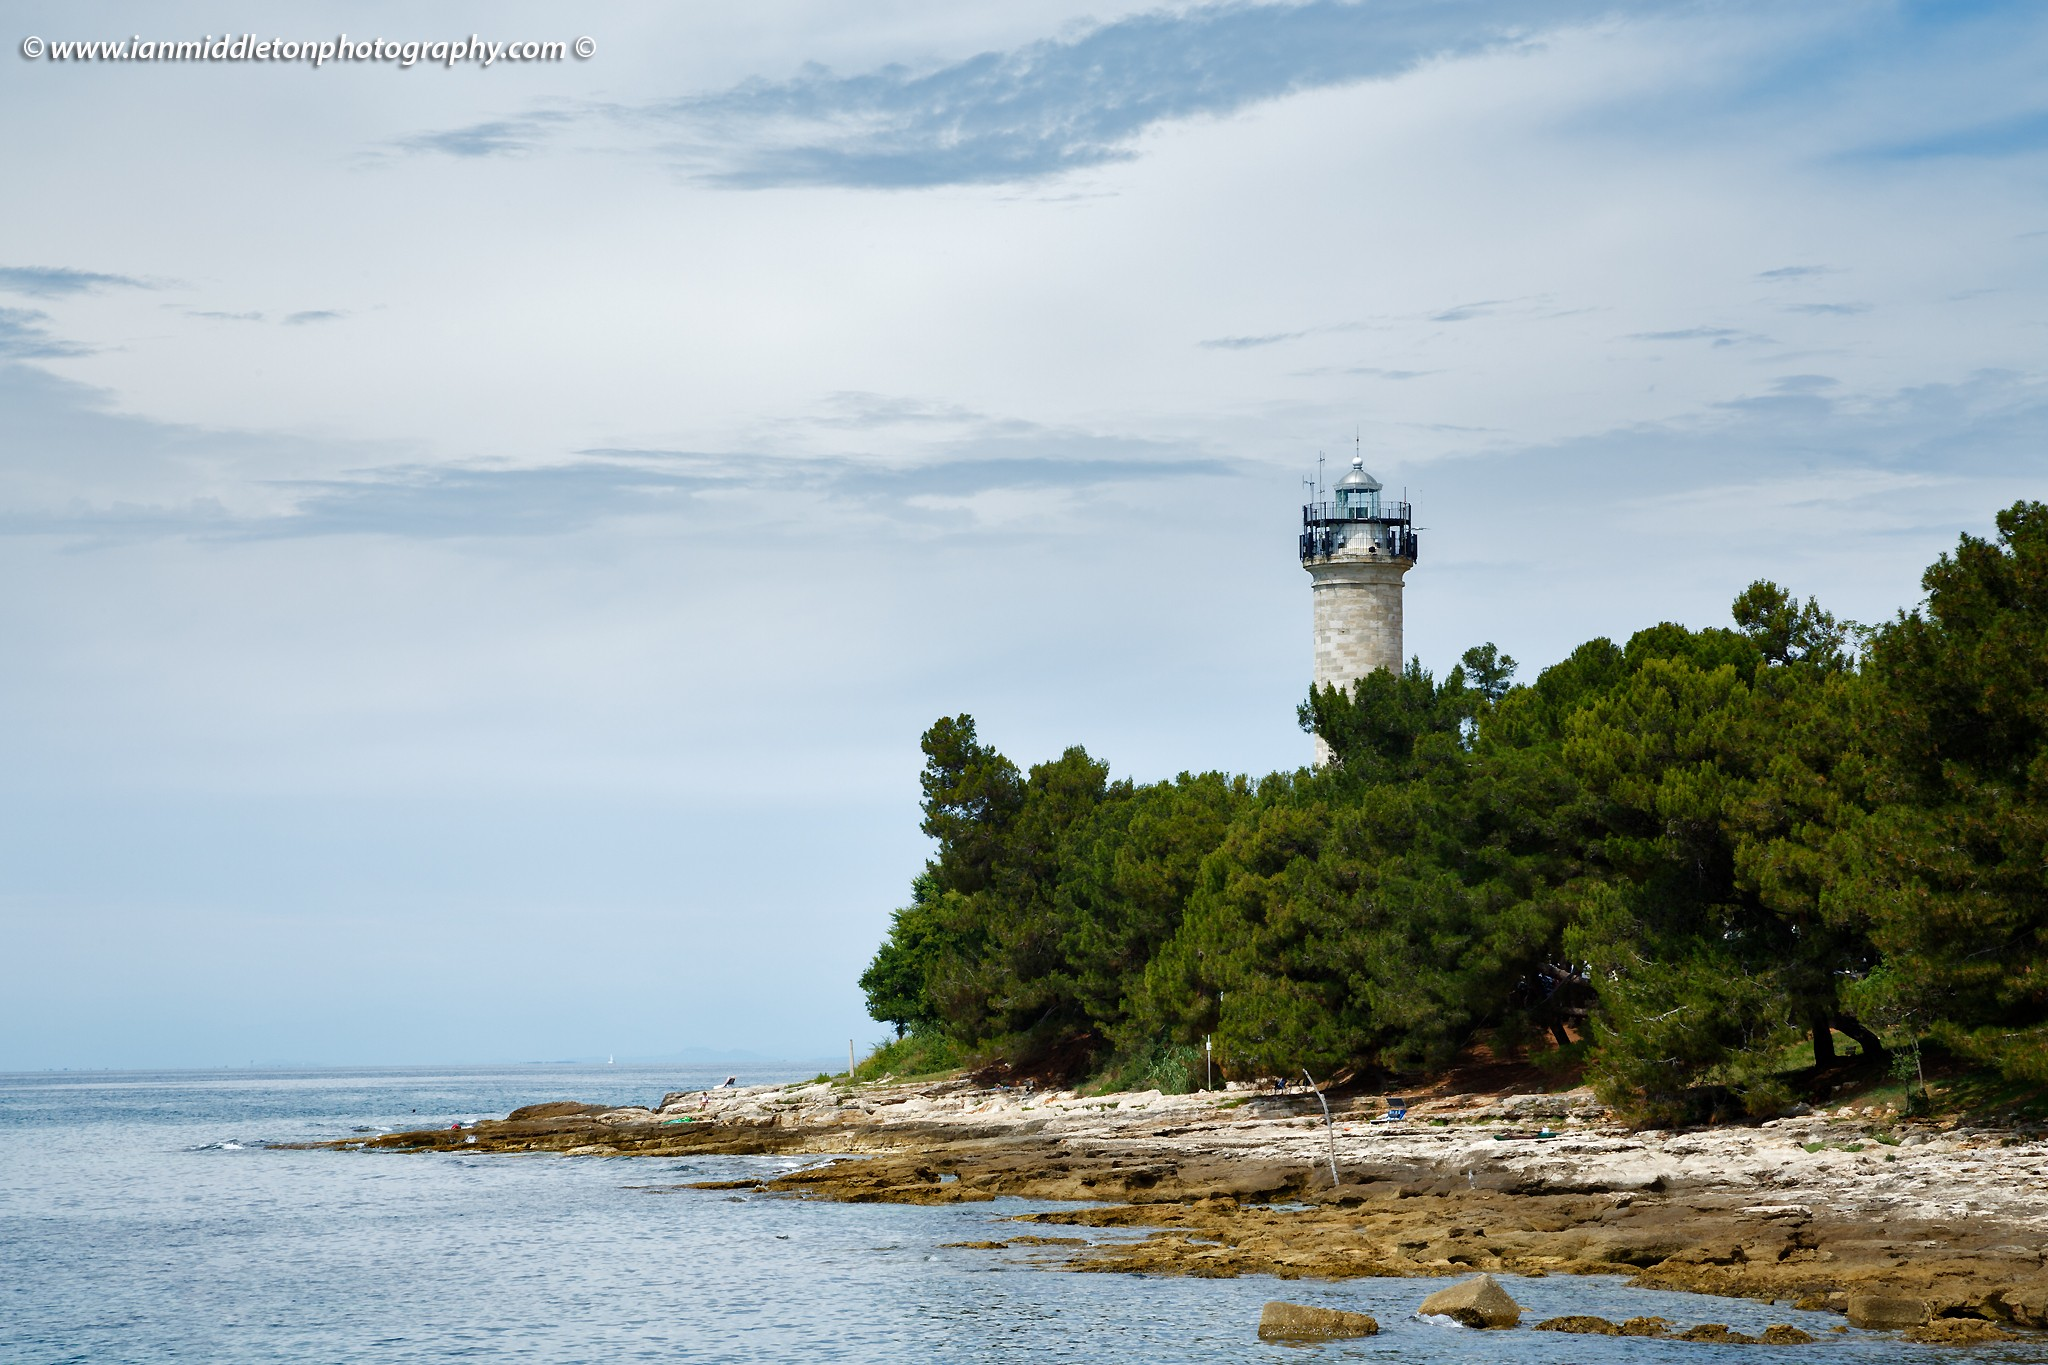 Savudrija Lighthouse seen from Basanija, Istria Coast, Croatia.